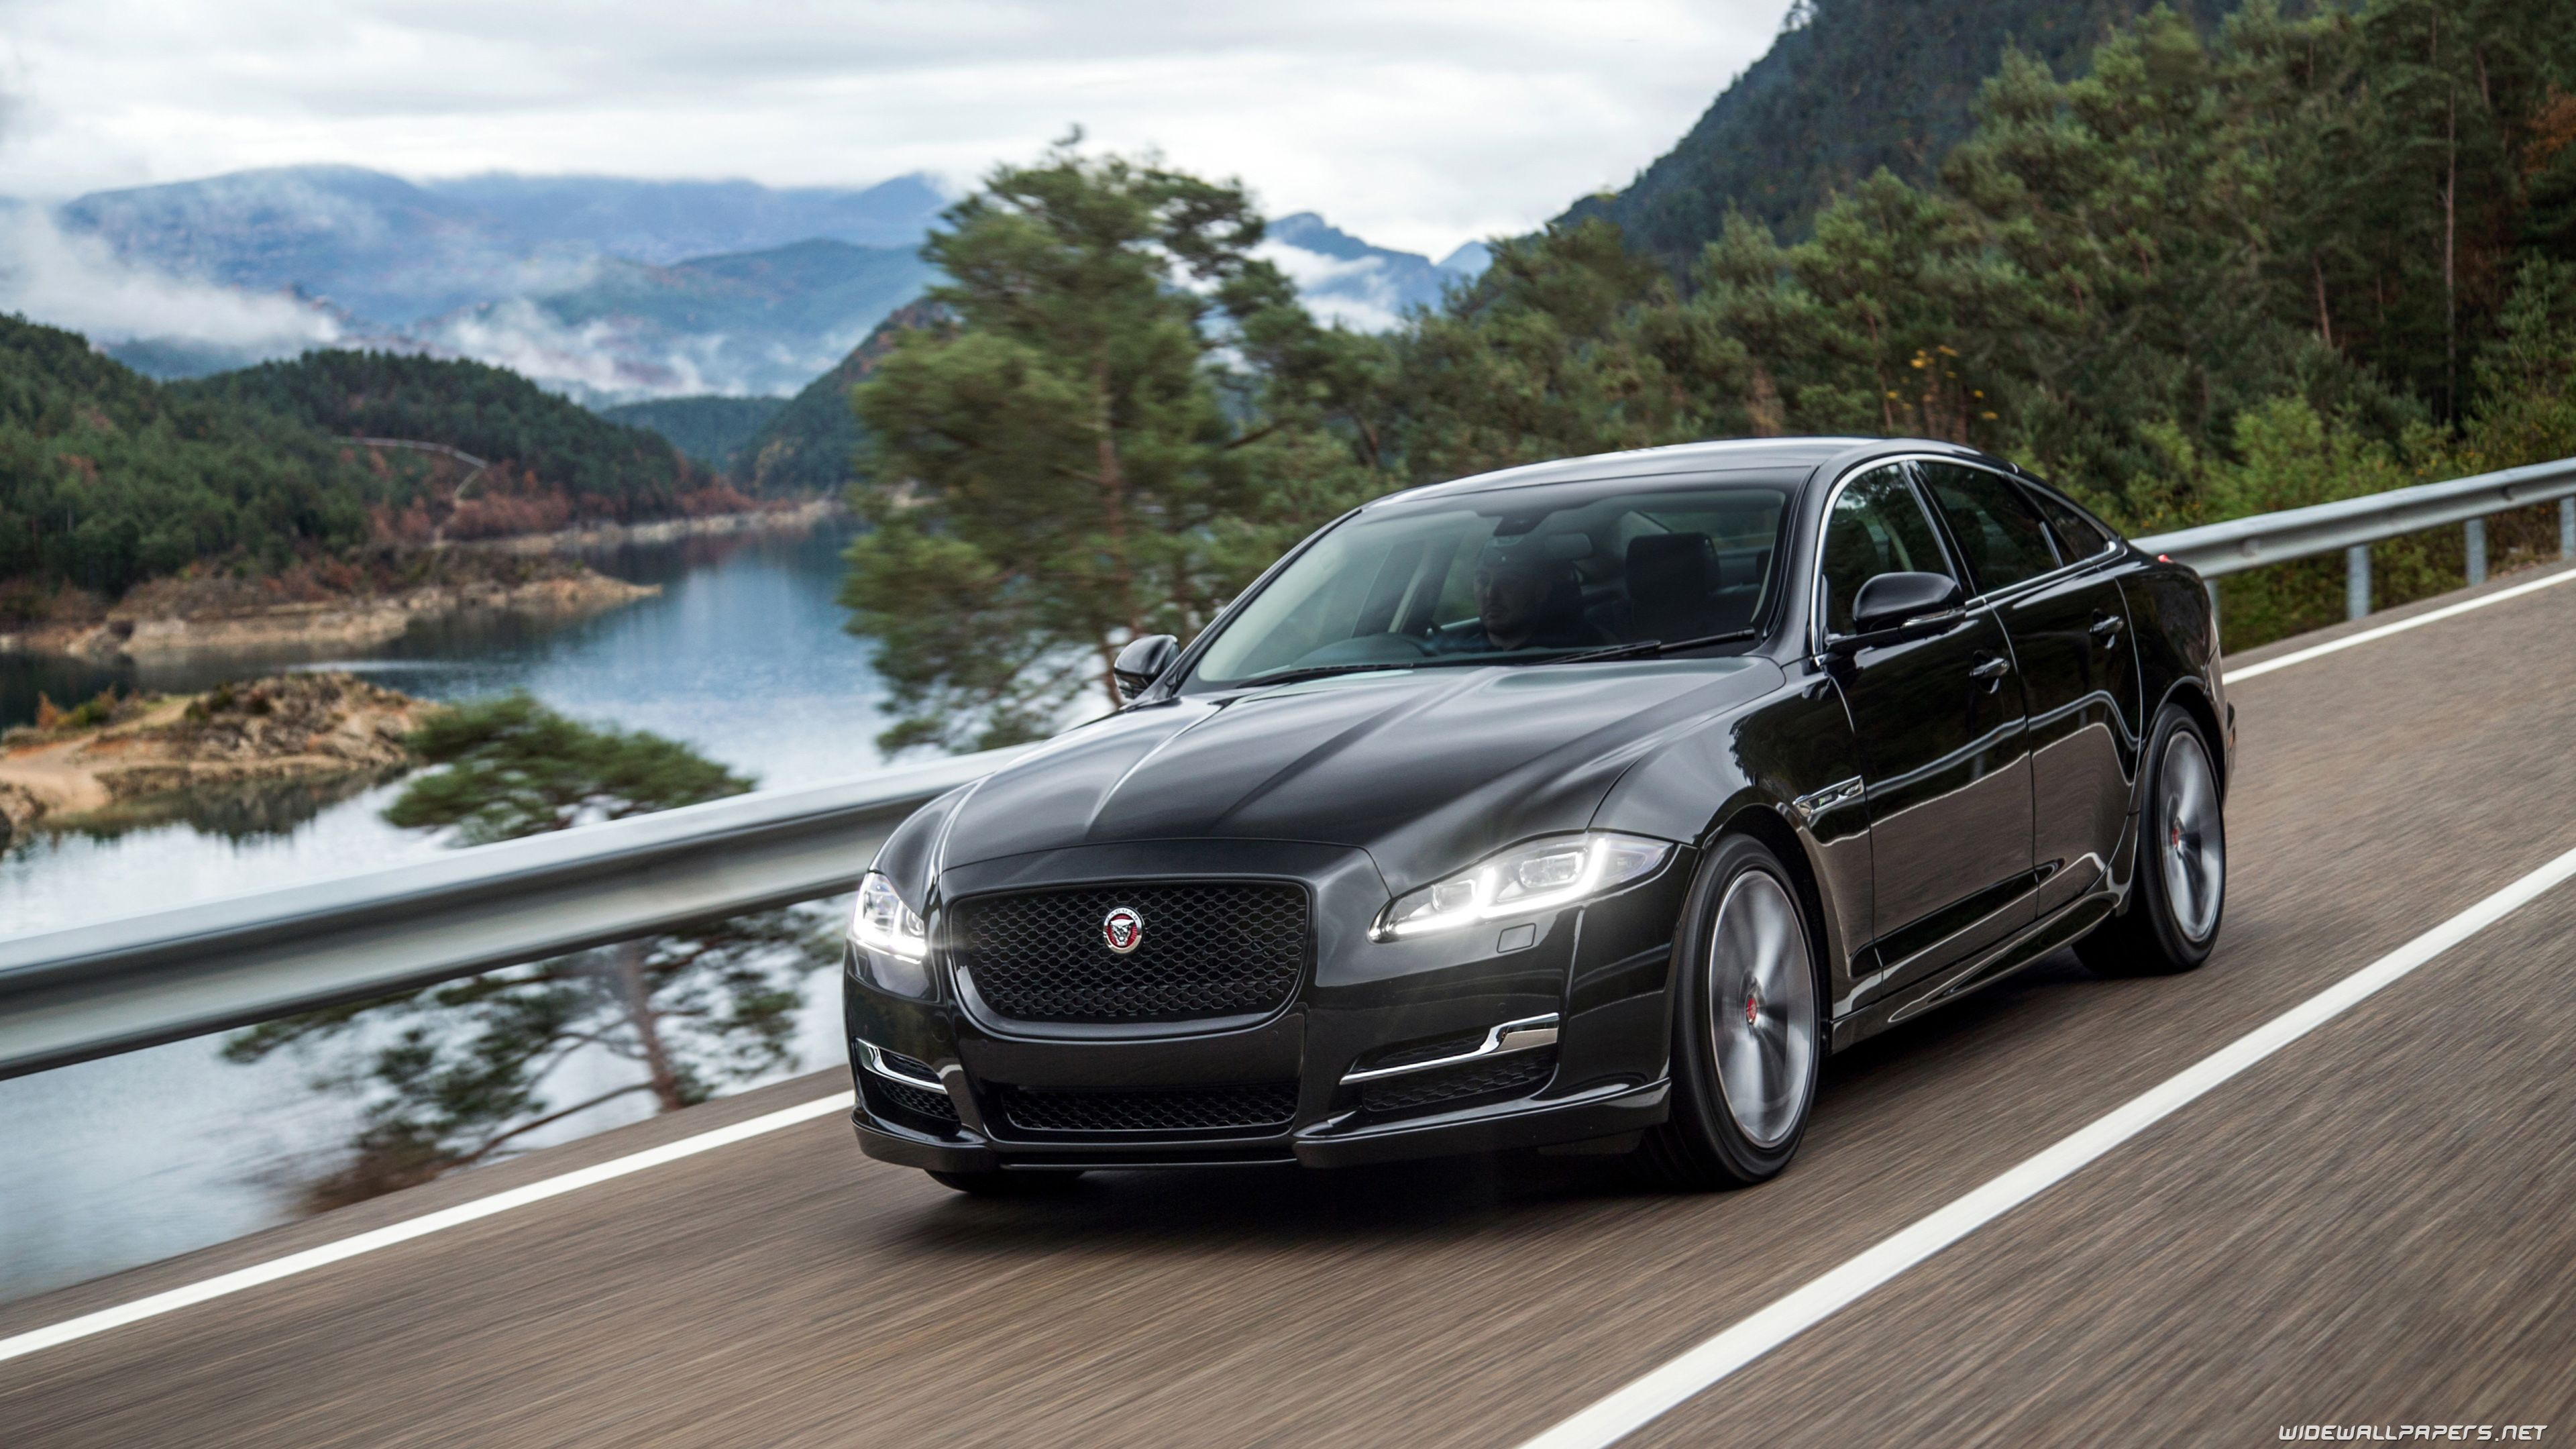 Jaguar Sports Car Wallpapers